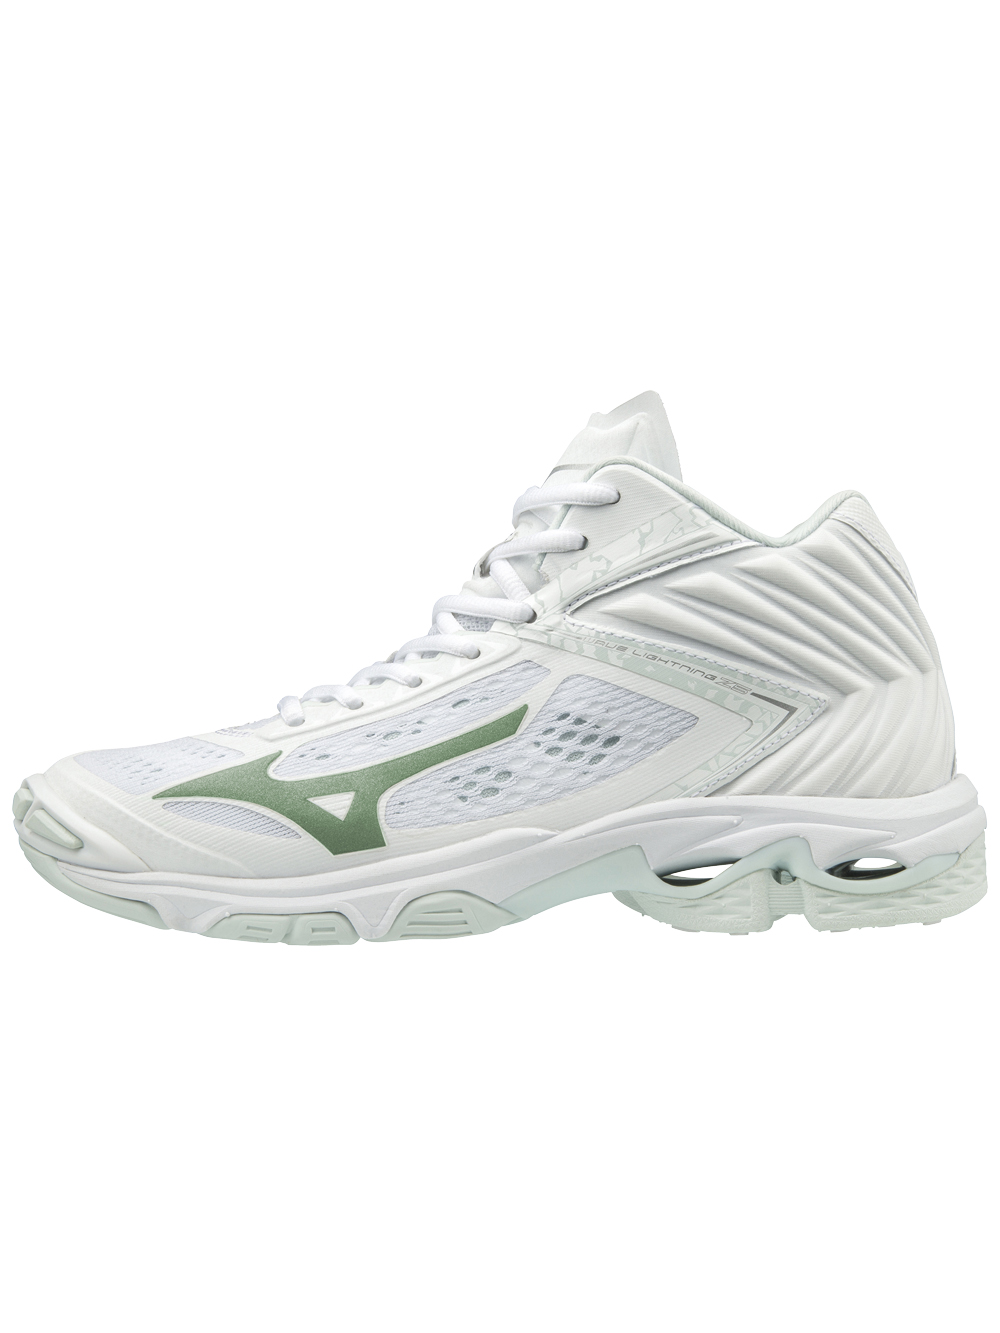 goalinn mizuno volleyball shoes 40